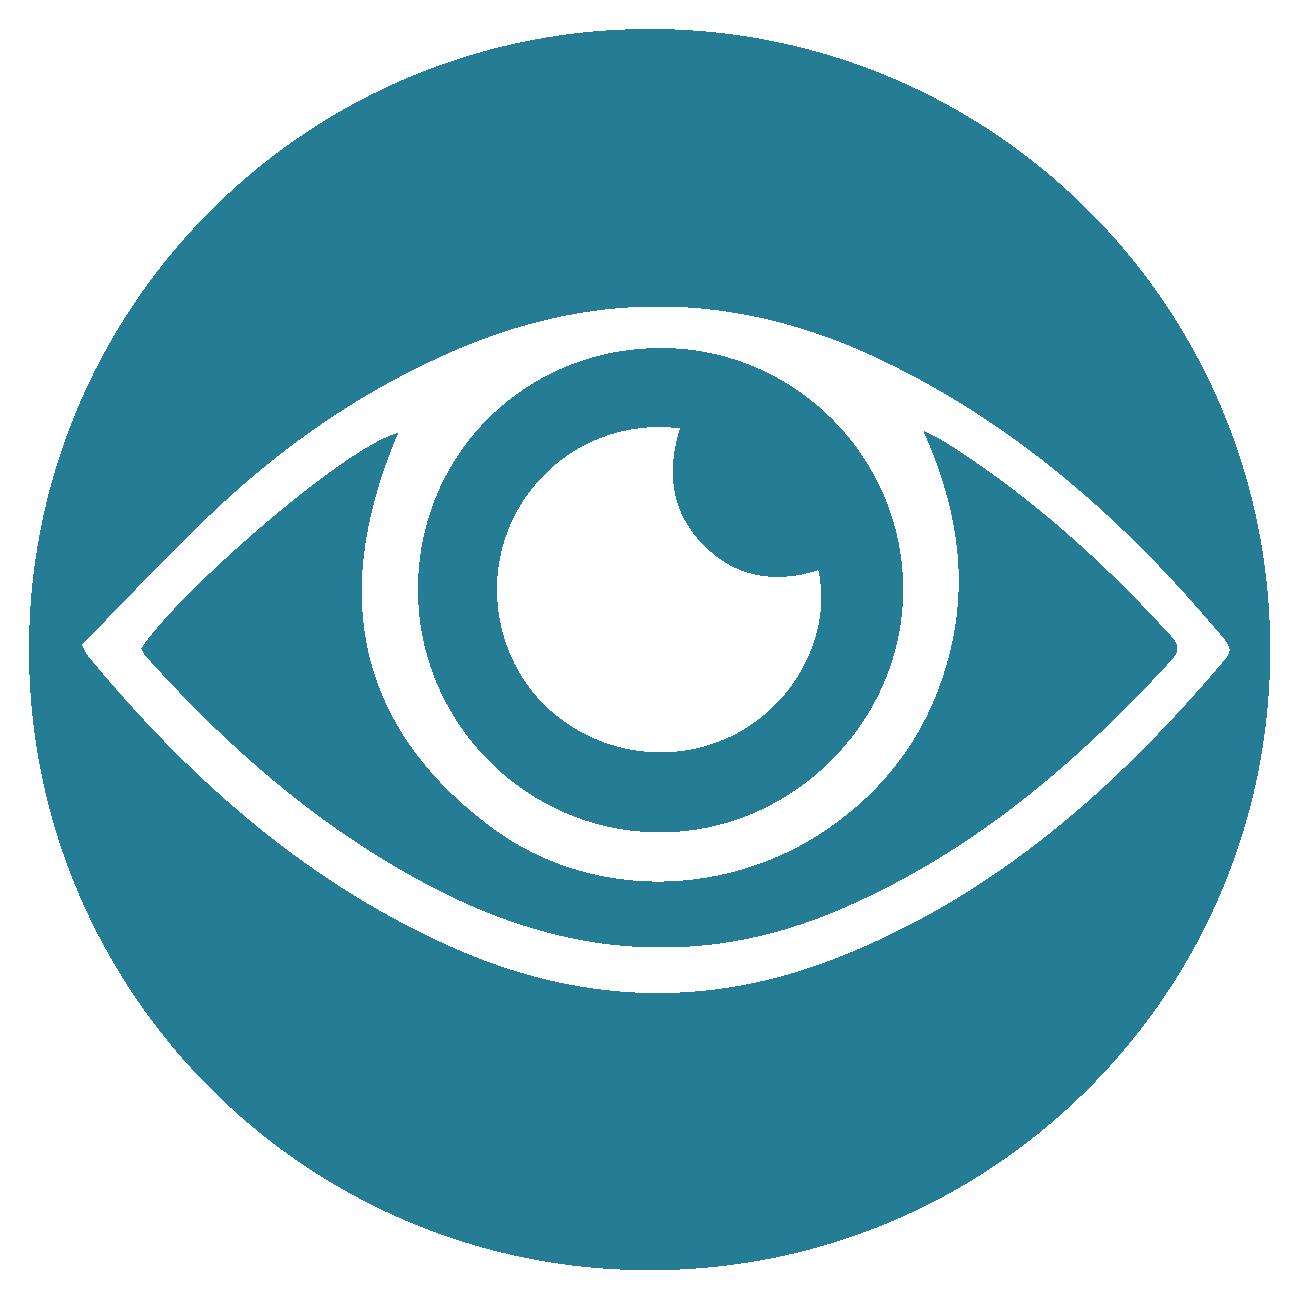 Vision-Eye